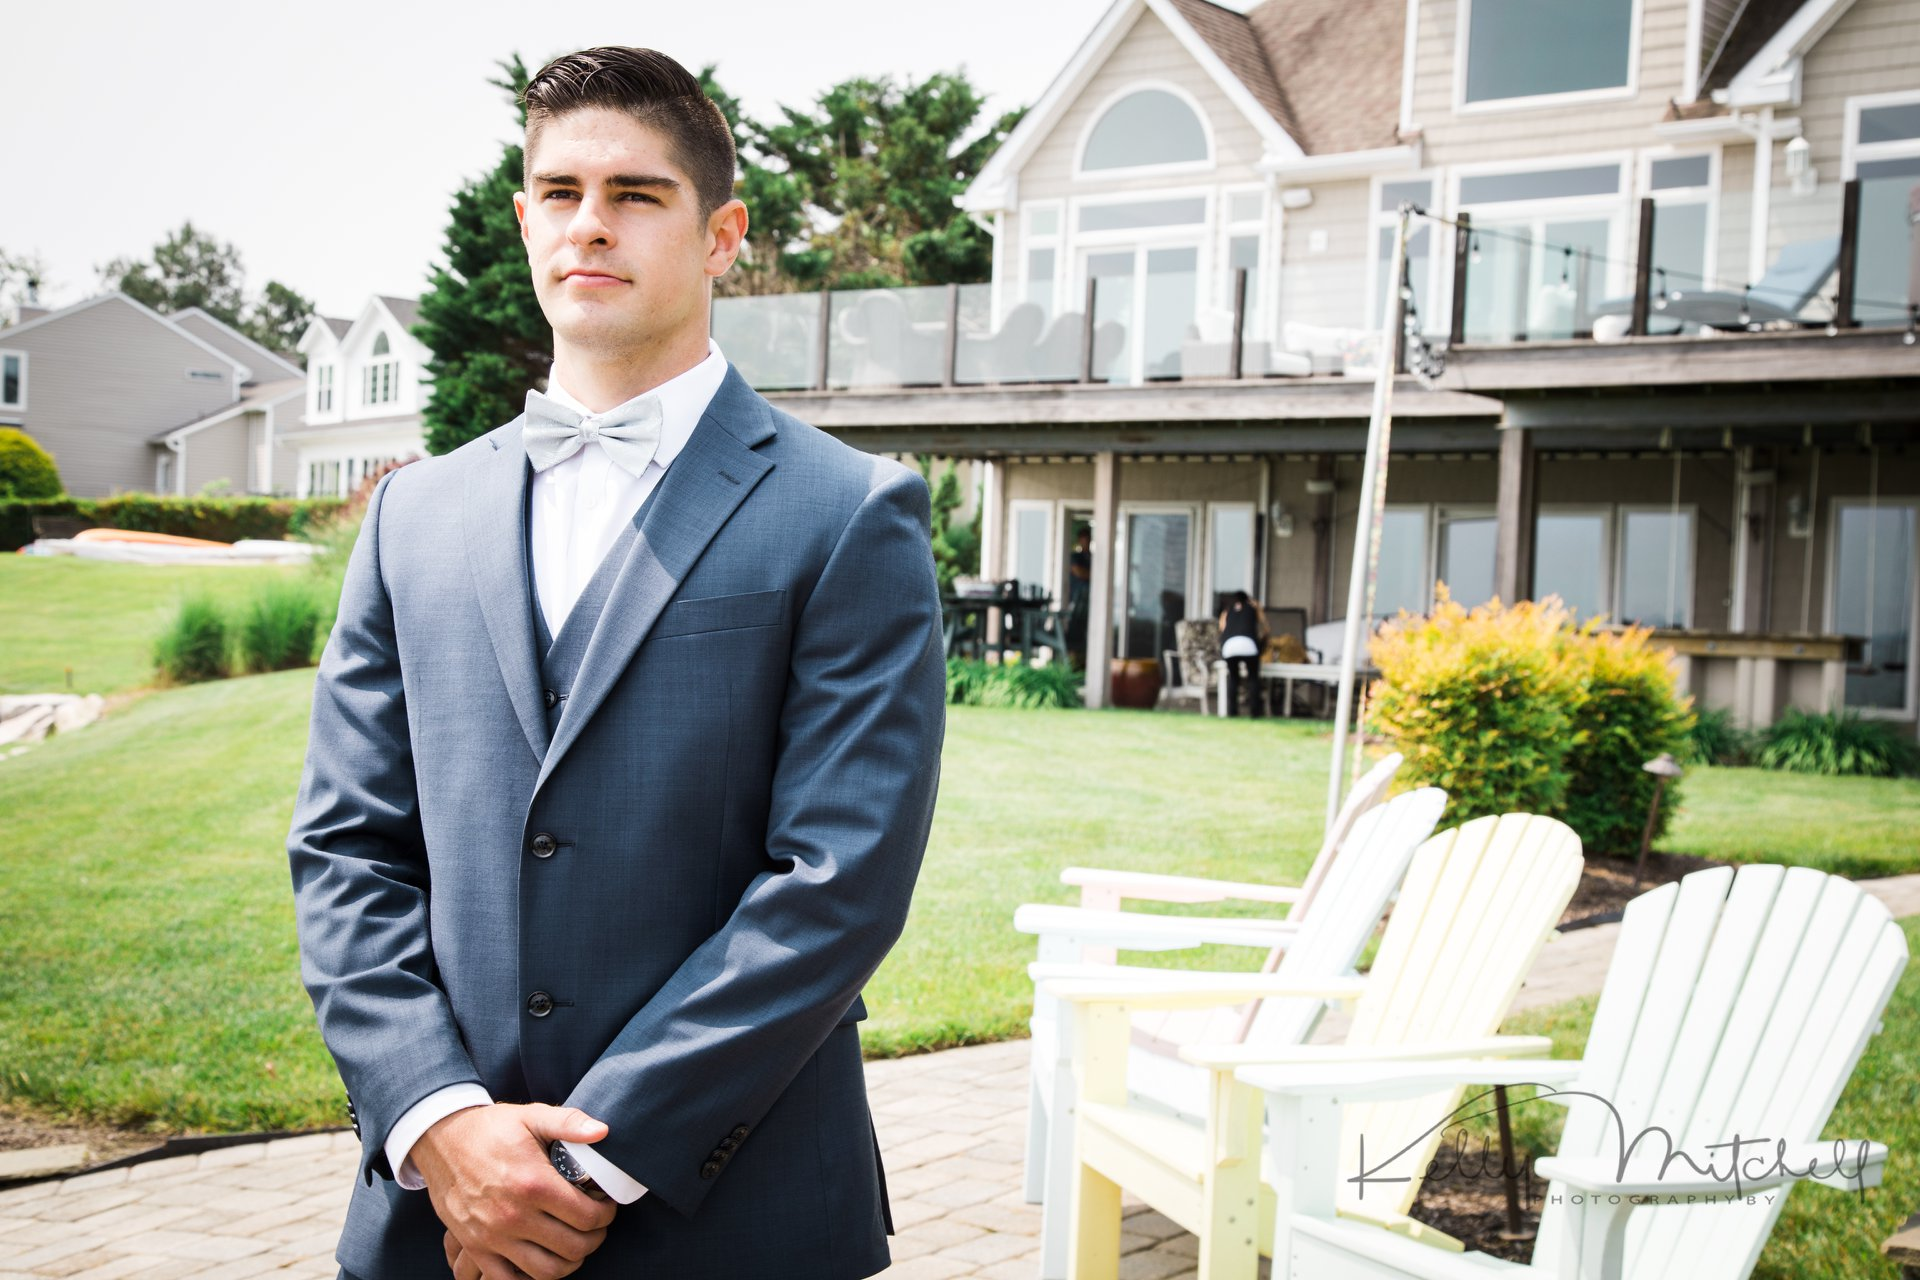 groom first look, annapolis wedding venue, navy suit, groomsmen, summer wedding, june wedding, bowti